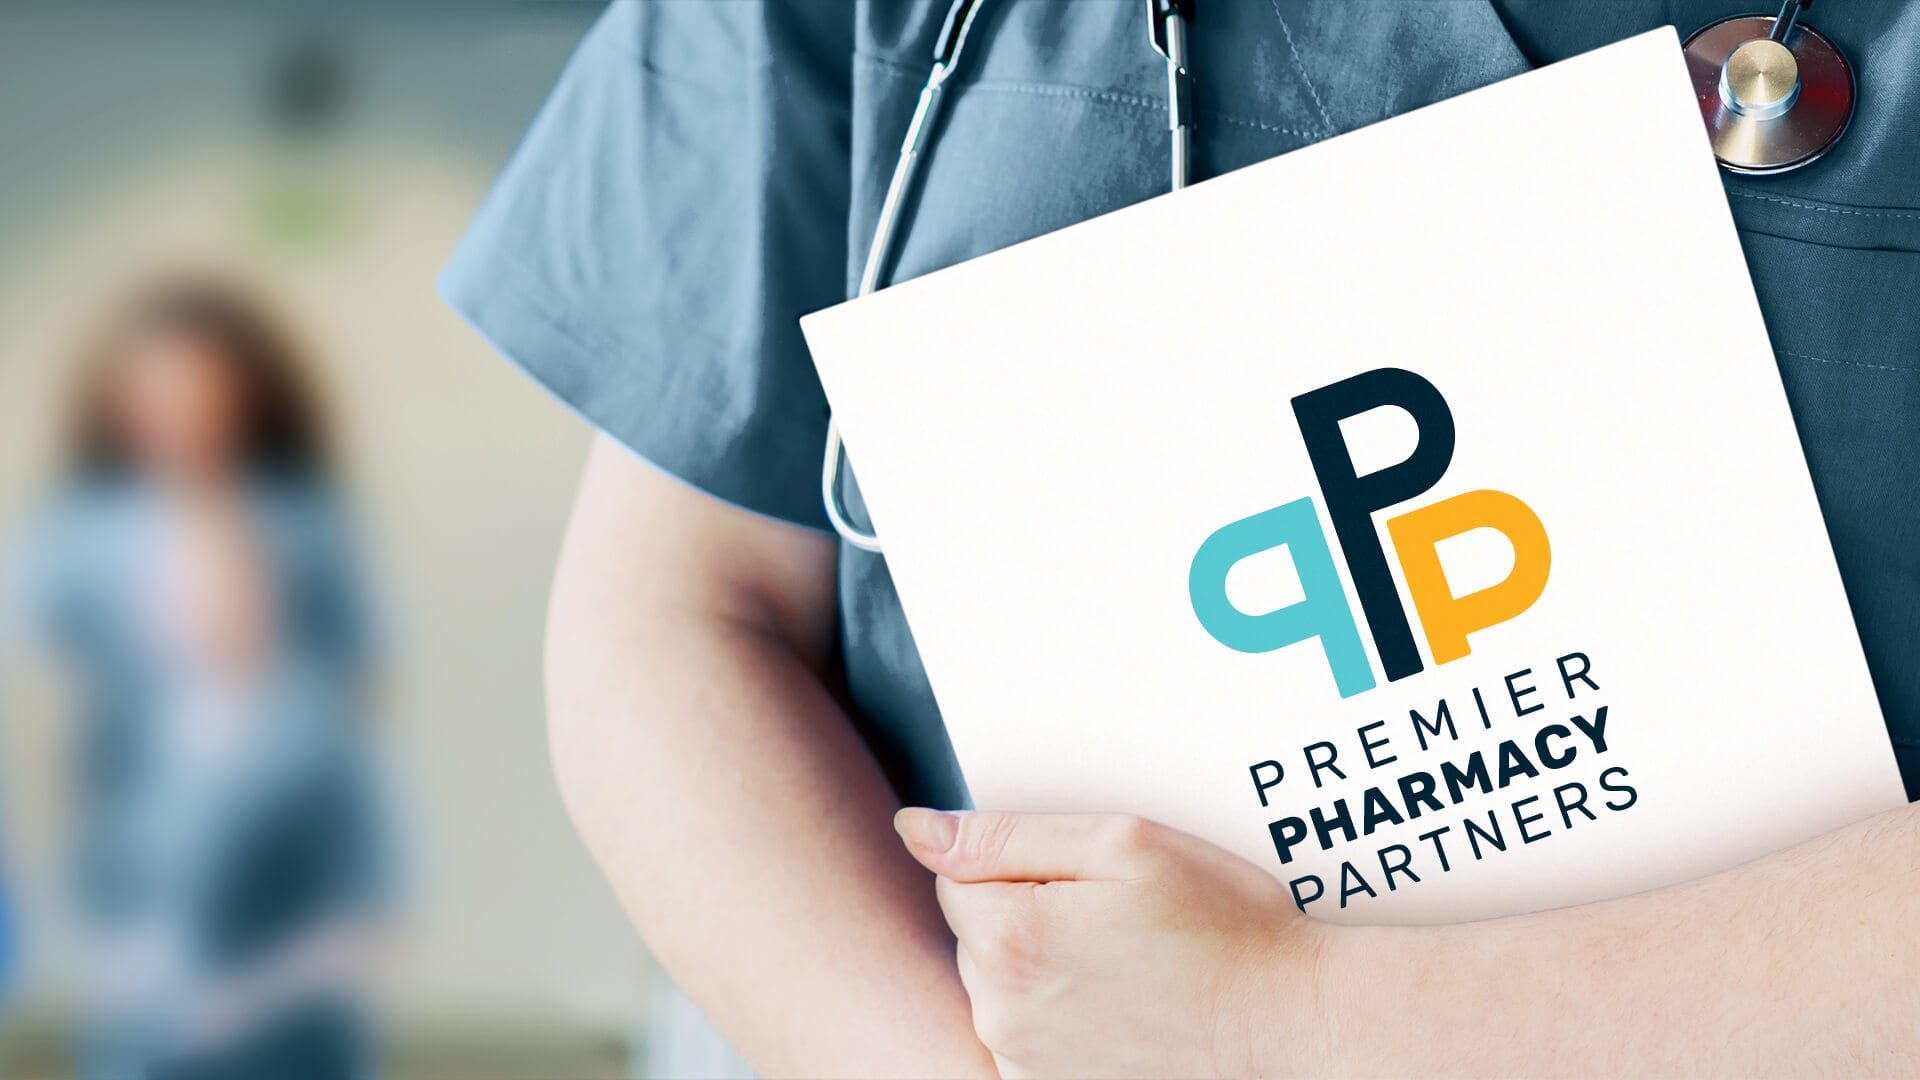 Premier Pharmacy Partners 6